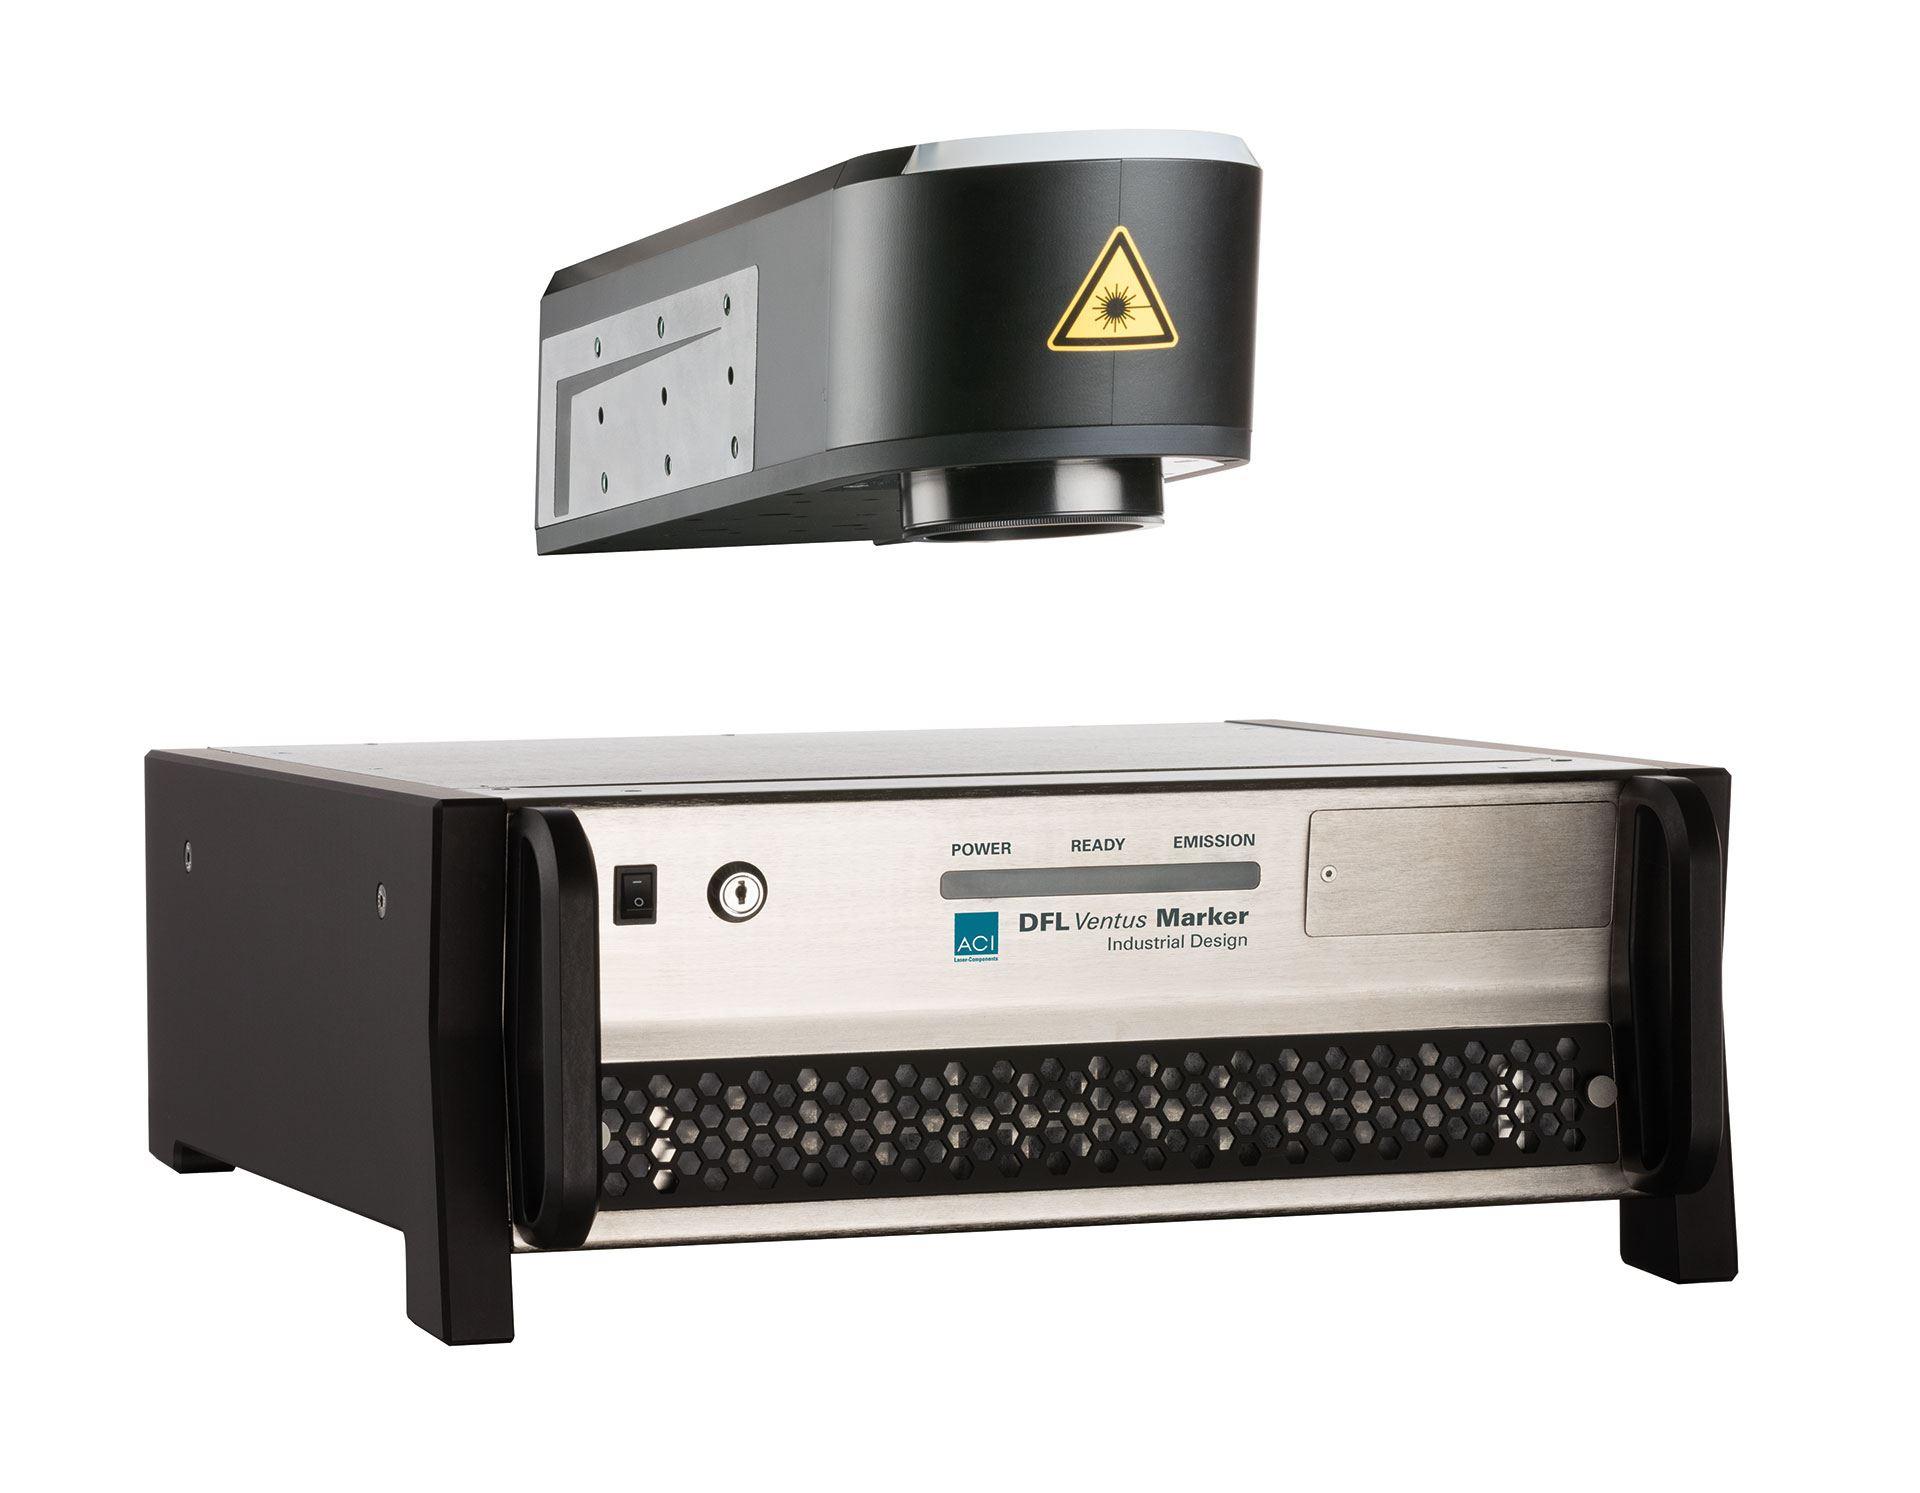 Laser marking systems for integrators